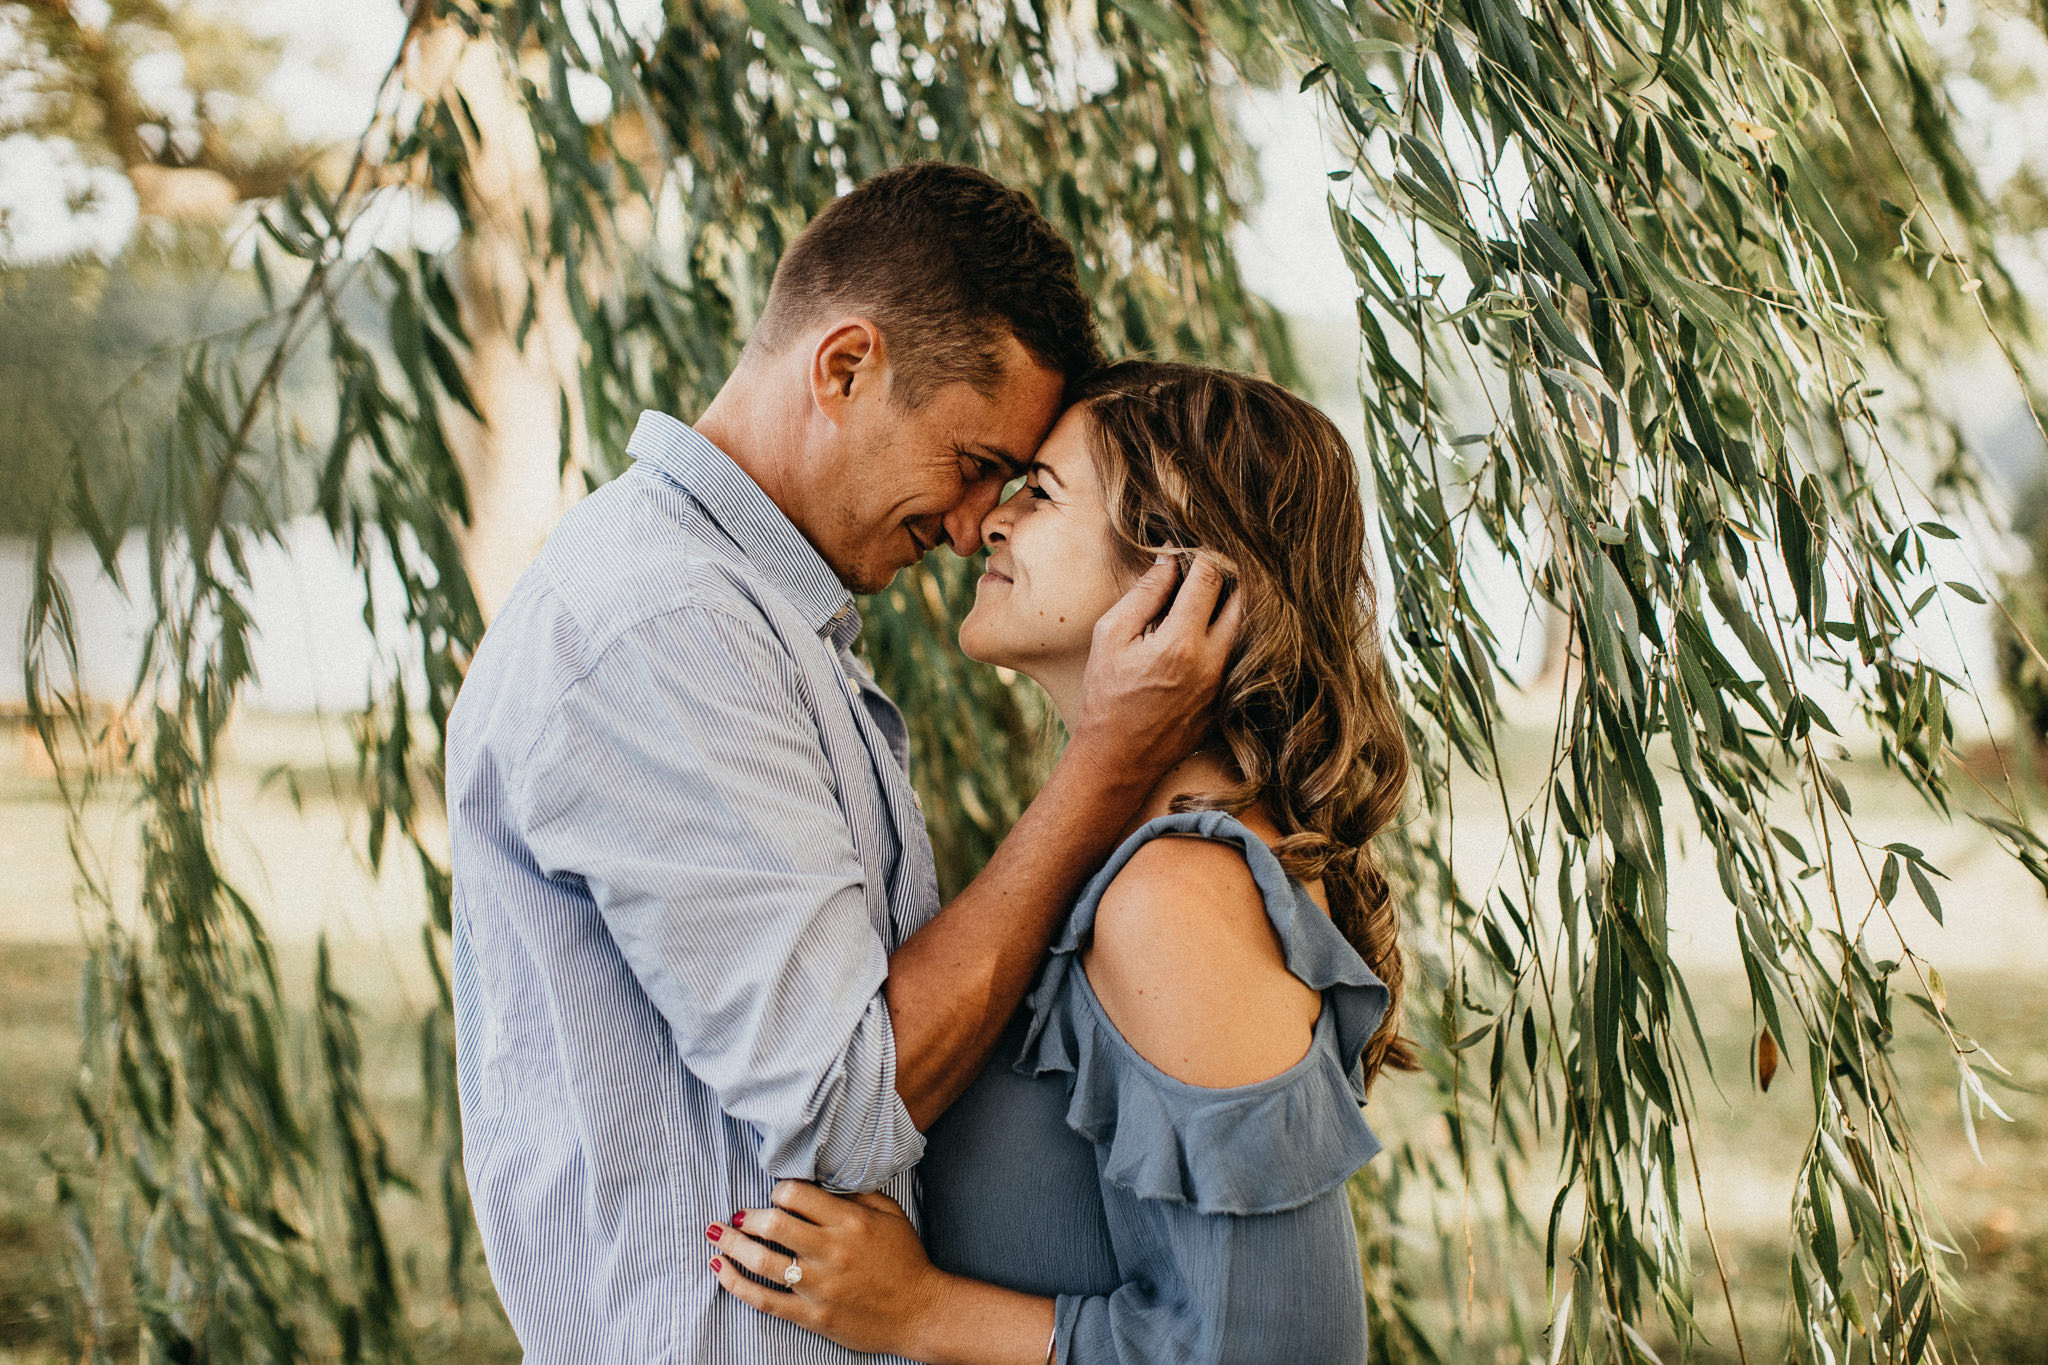 Claytor Lake State Park - Engagement portraits - Virginia wedding photographer - Pat Cori Photography-9.jpg